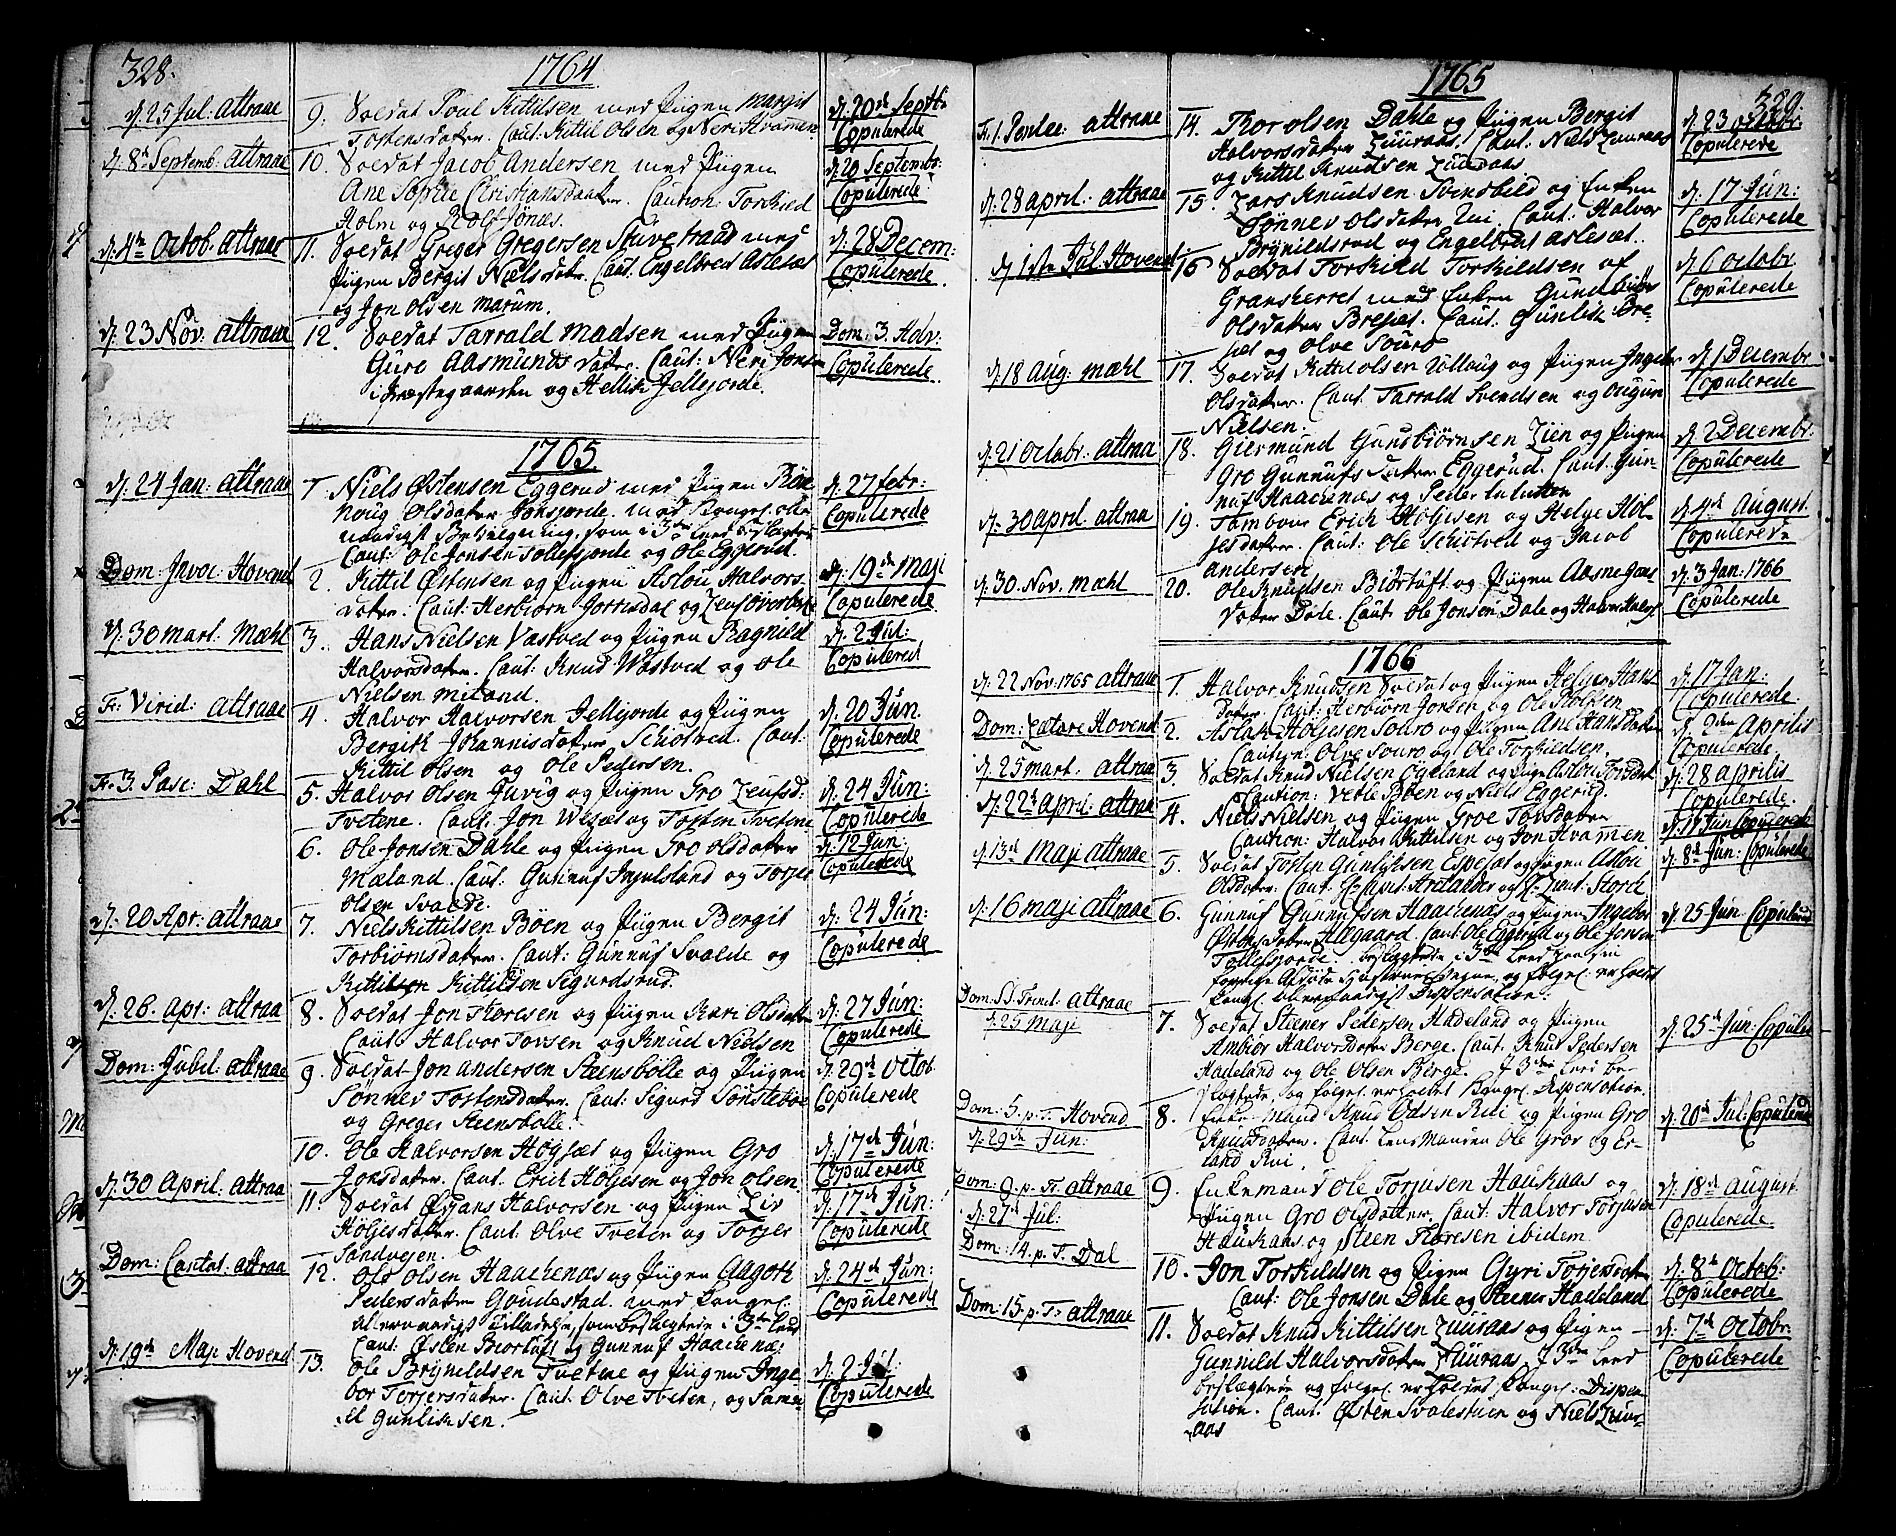 SAKO, Tinn kirkebøker, F/Fa/L0002: Ministerialbok nr. I 2, 1757-1810, s. 328-329